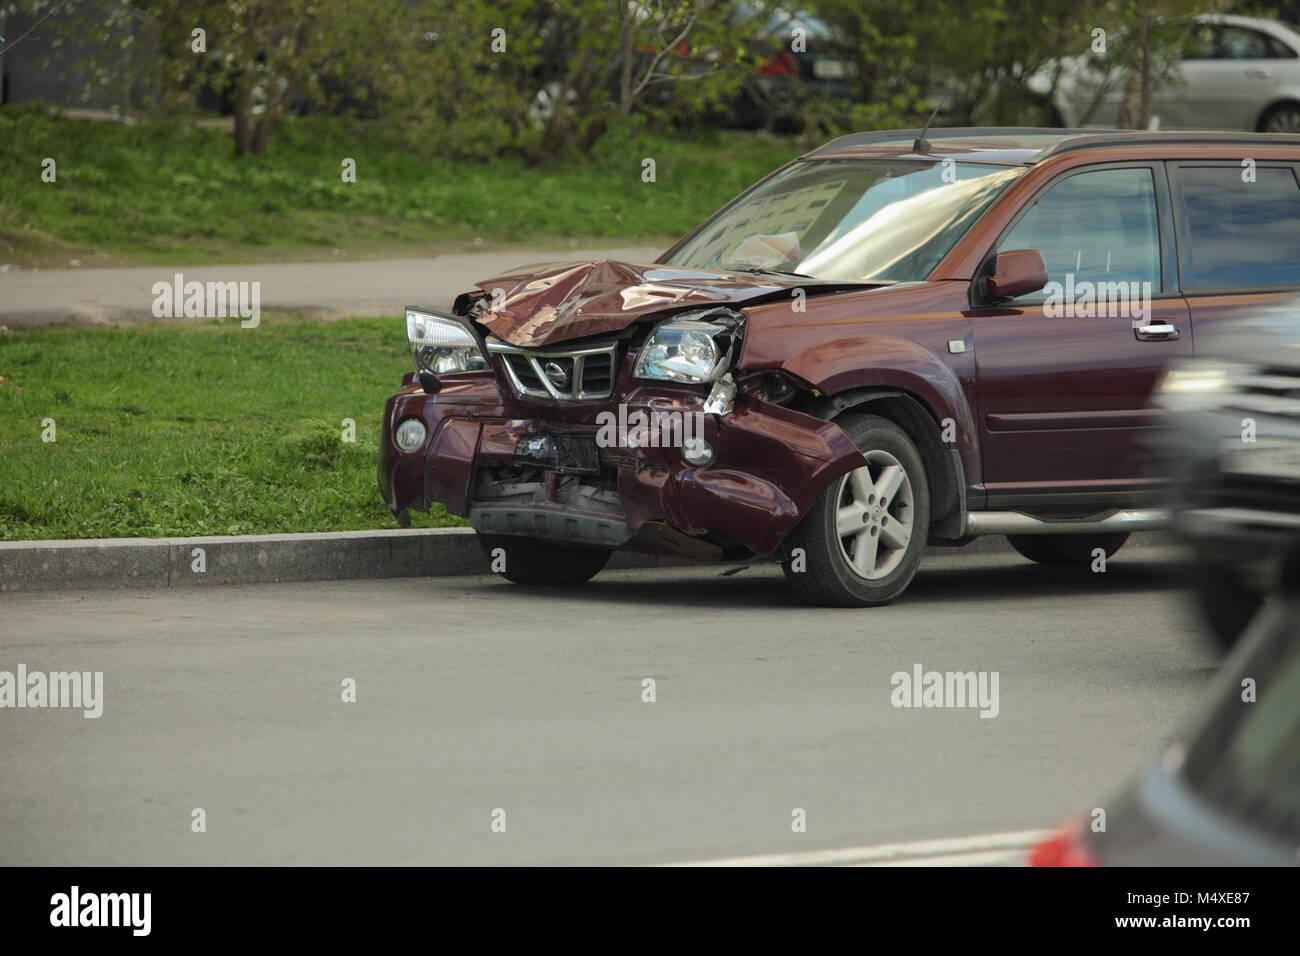 Car crash head-on collision - Stock Image